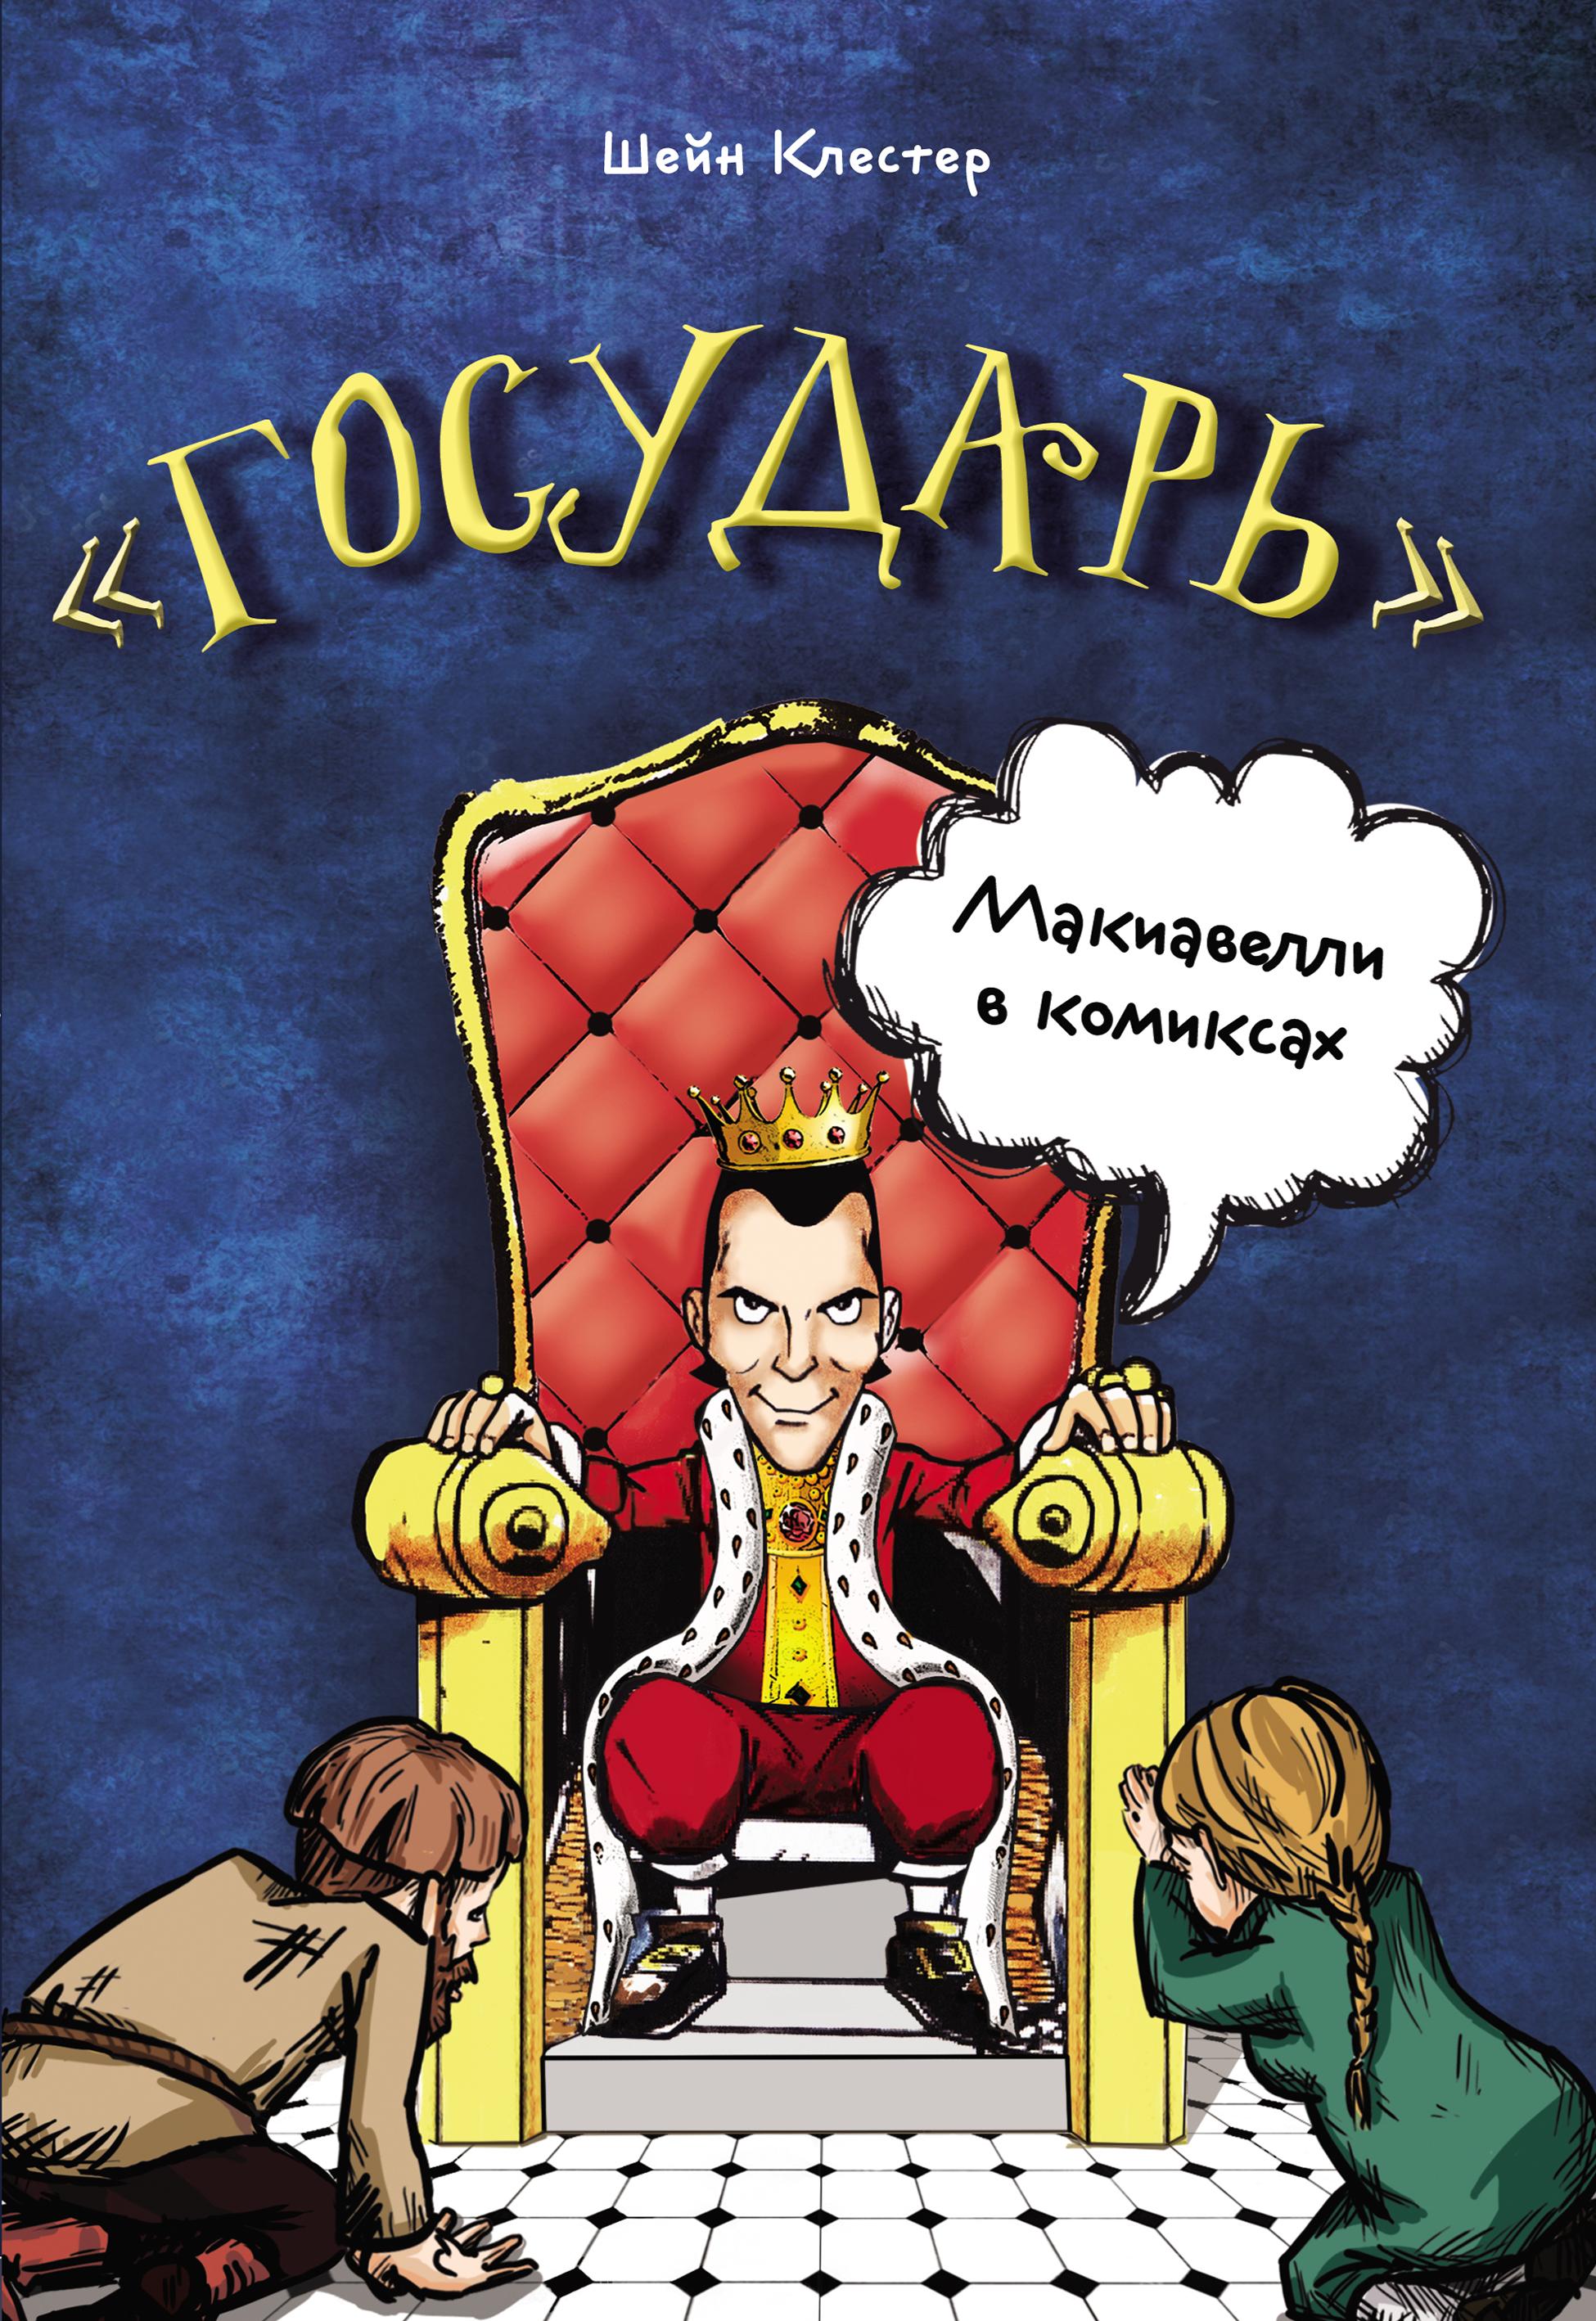 Никколо Макиавелли «Государь» Макиавелли в комиксах никколо макиавелли государь